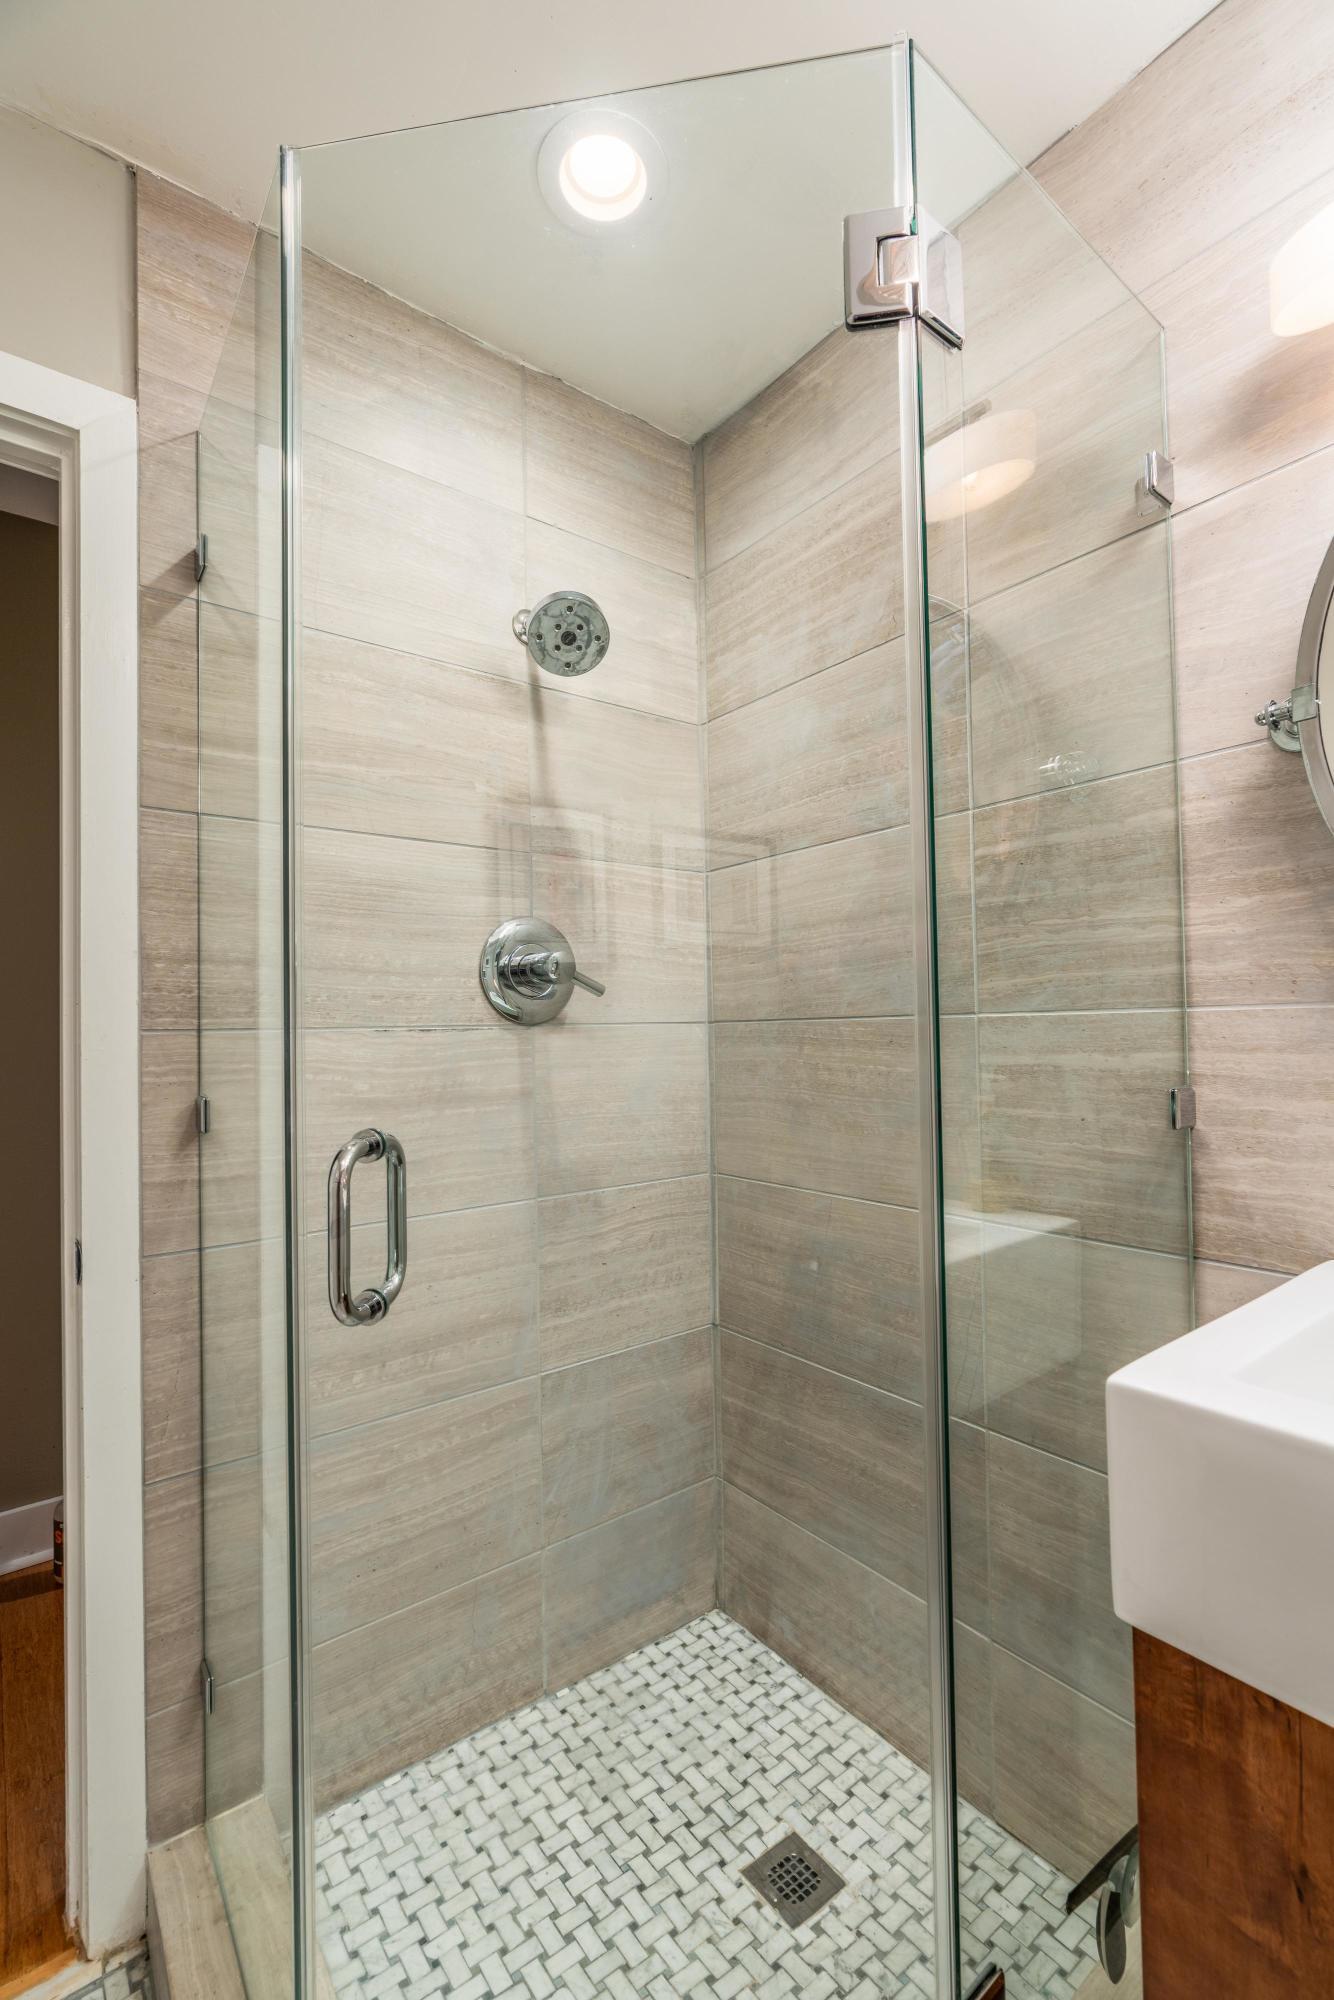 White Point Estates Homes For Sale - 894 White Point, Charleston, SC - 13